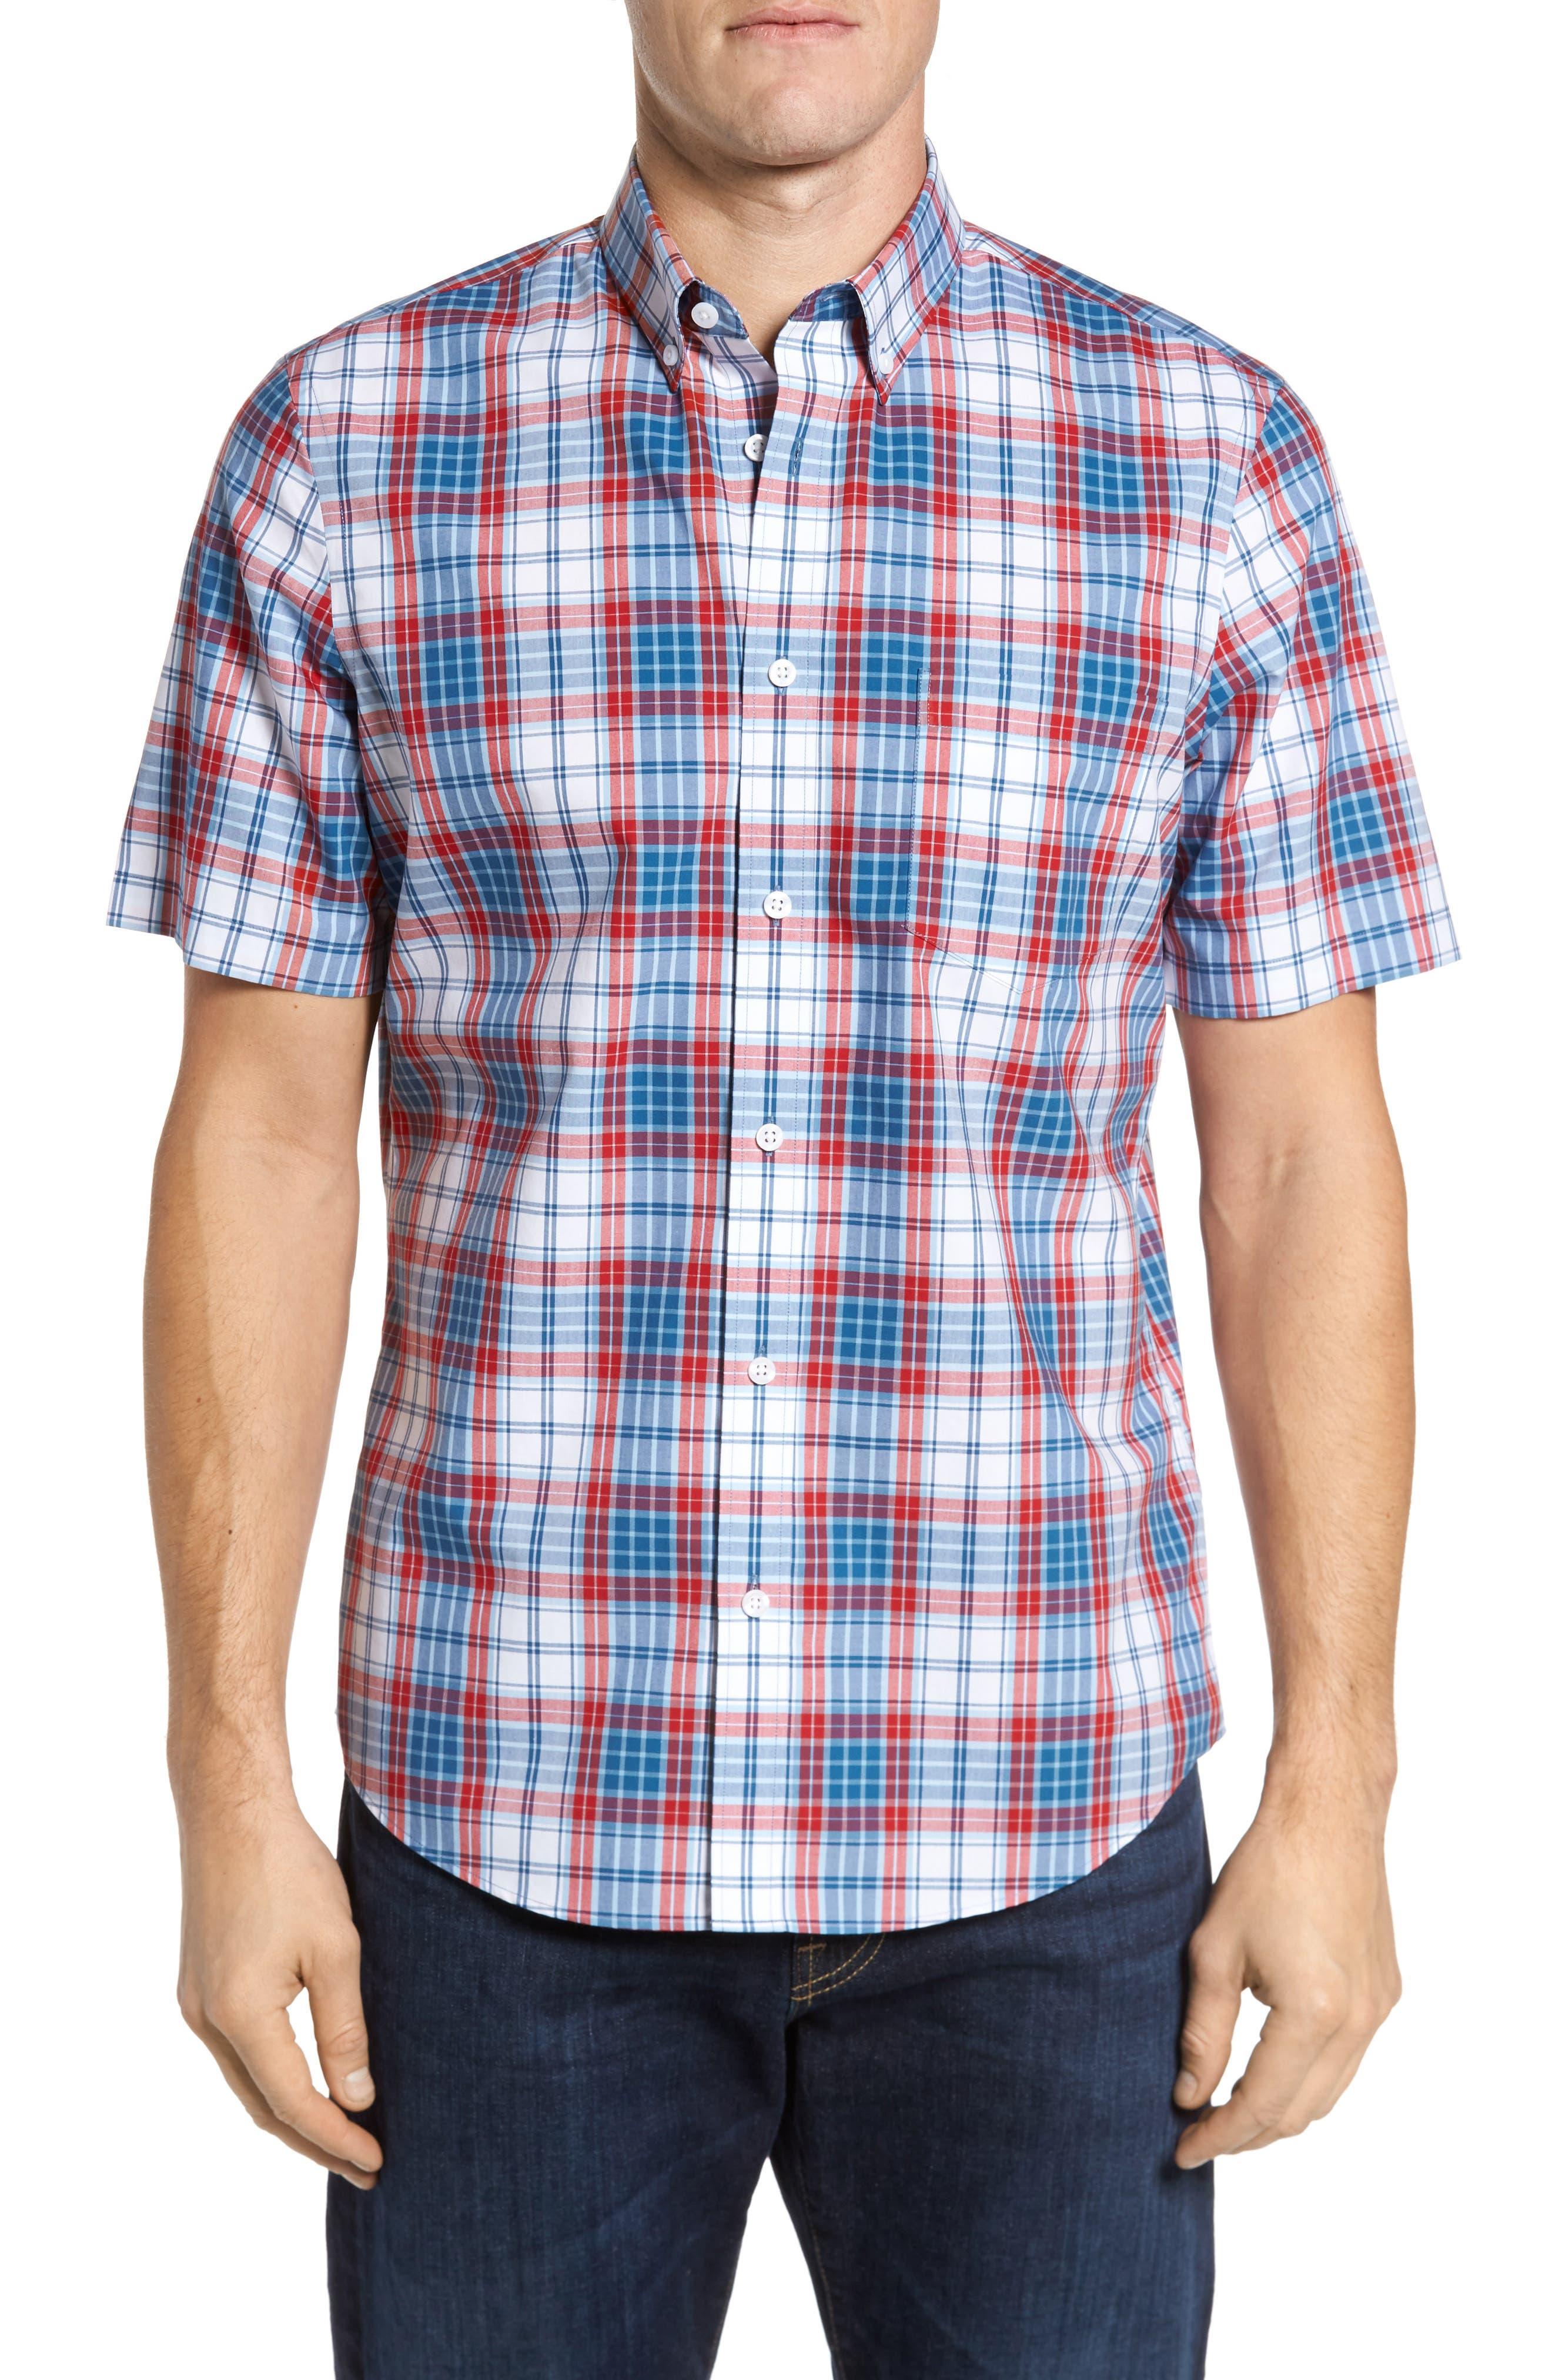 Smartcare<sup>™</sup> Regular Fit Plaid Sport Shirt,                             Main thumbnail 1, color,                             White Red Heather Tartan